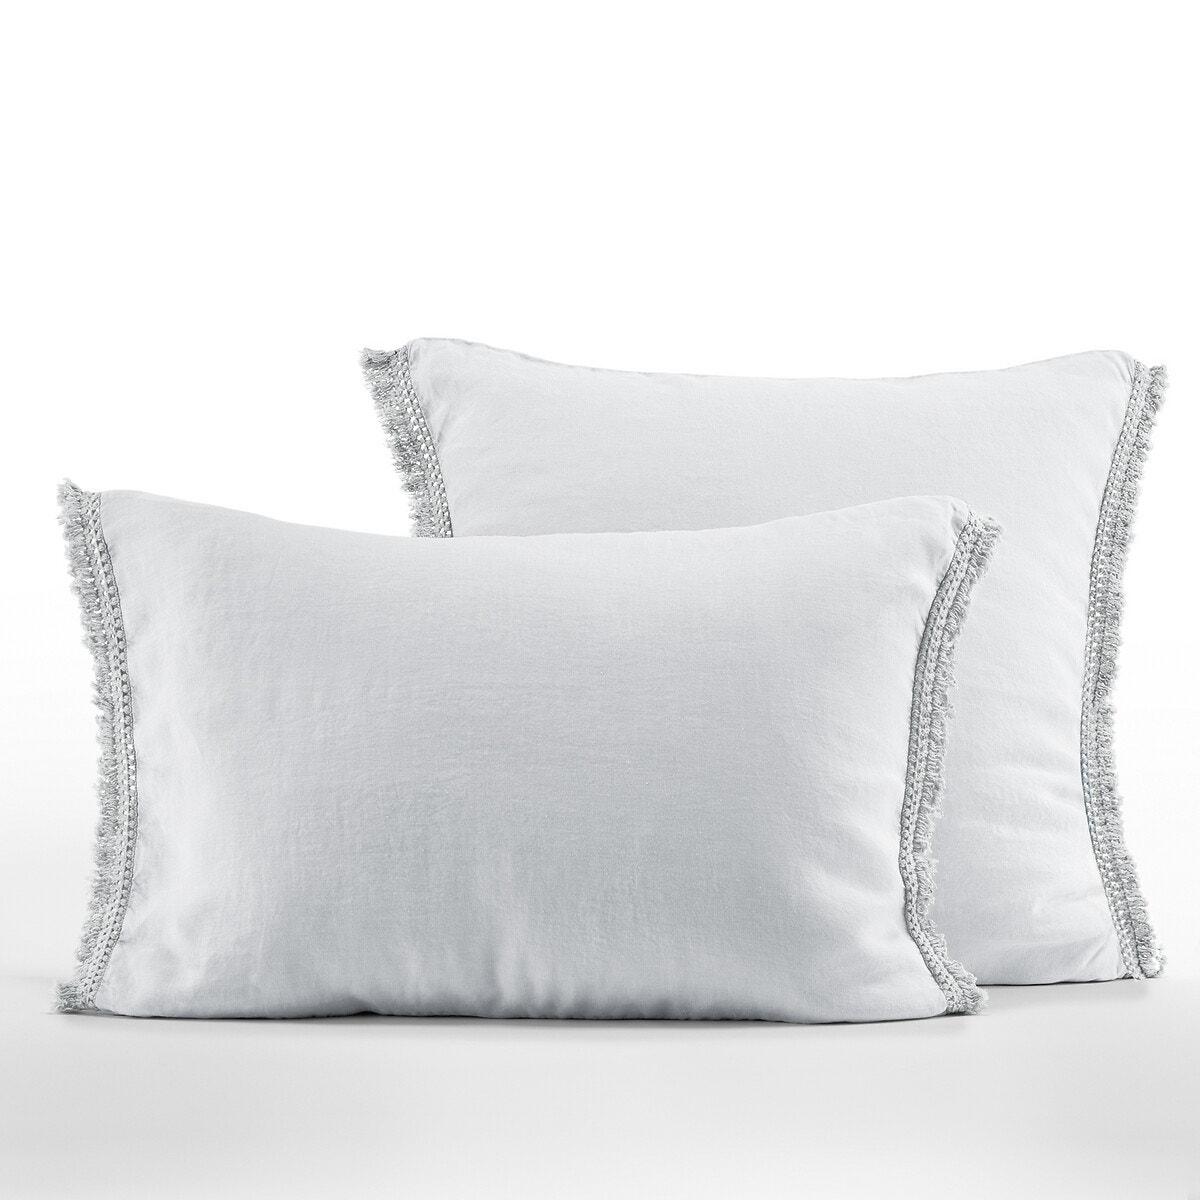 Kyra ウォッシュ加工ヘンプ 枕カバー